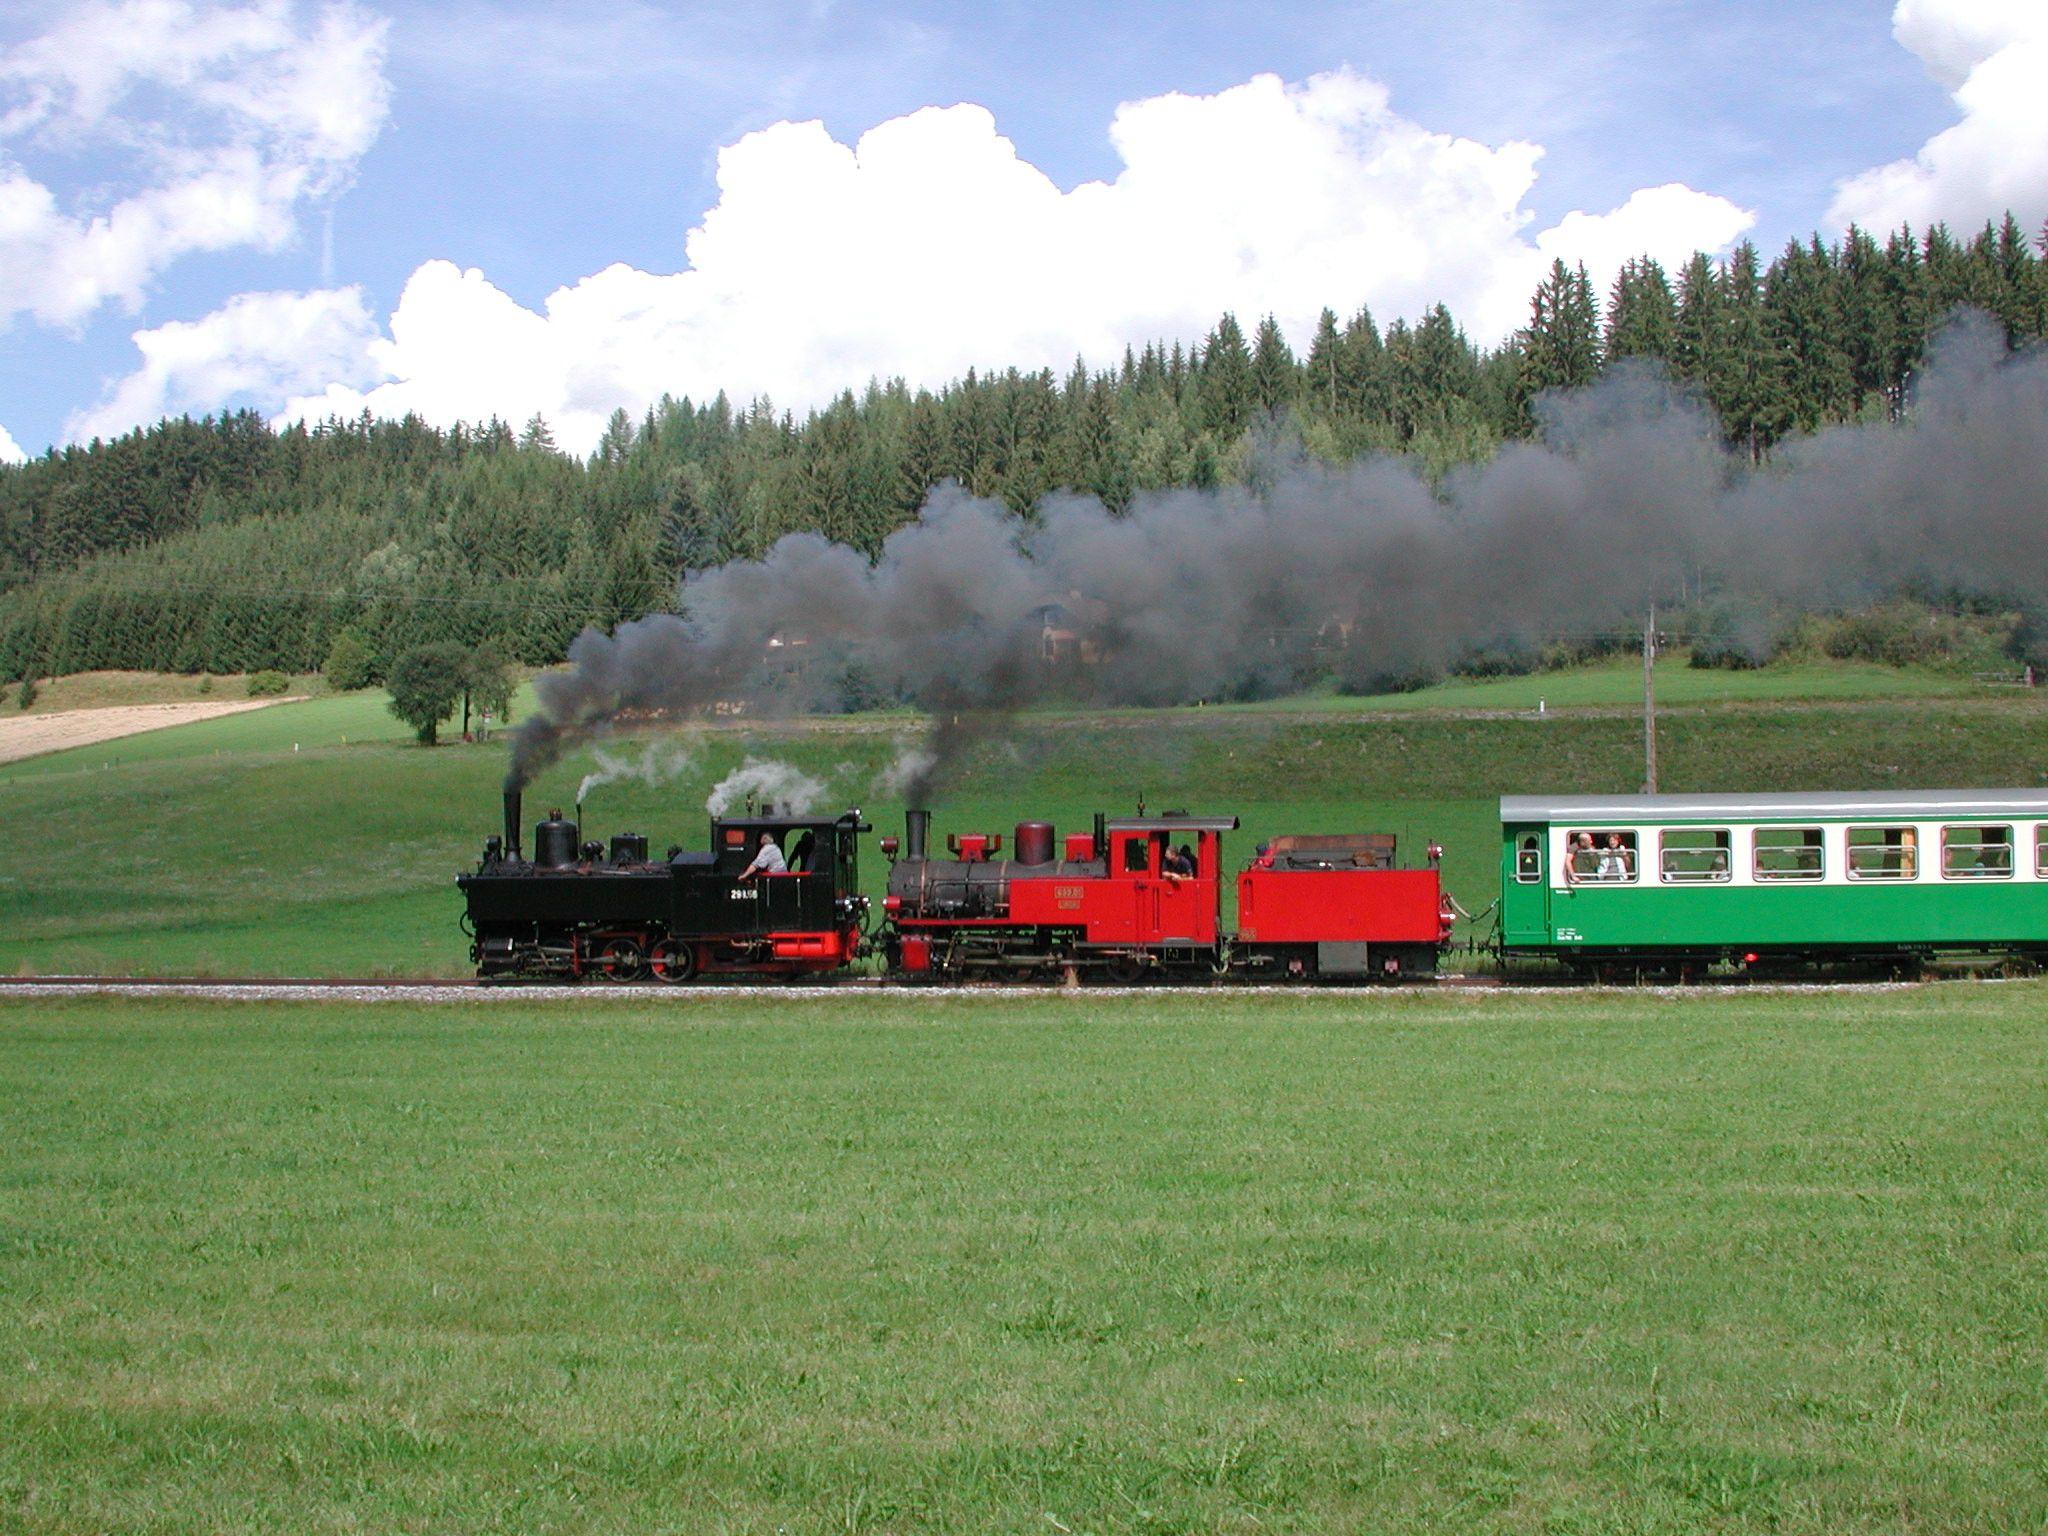 taurachbahn_foto-tvb-st-andr_33300640546